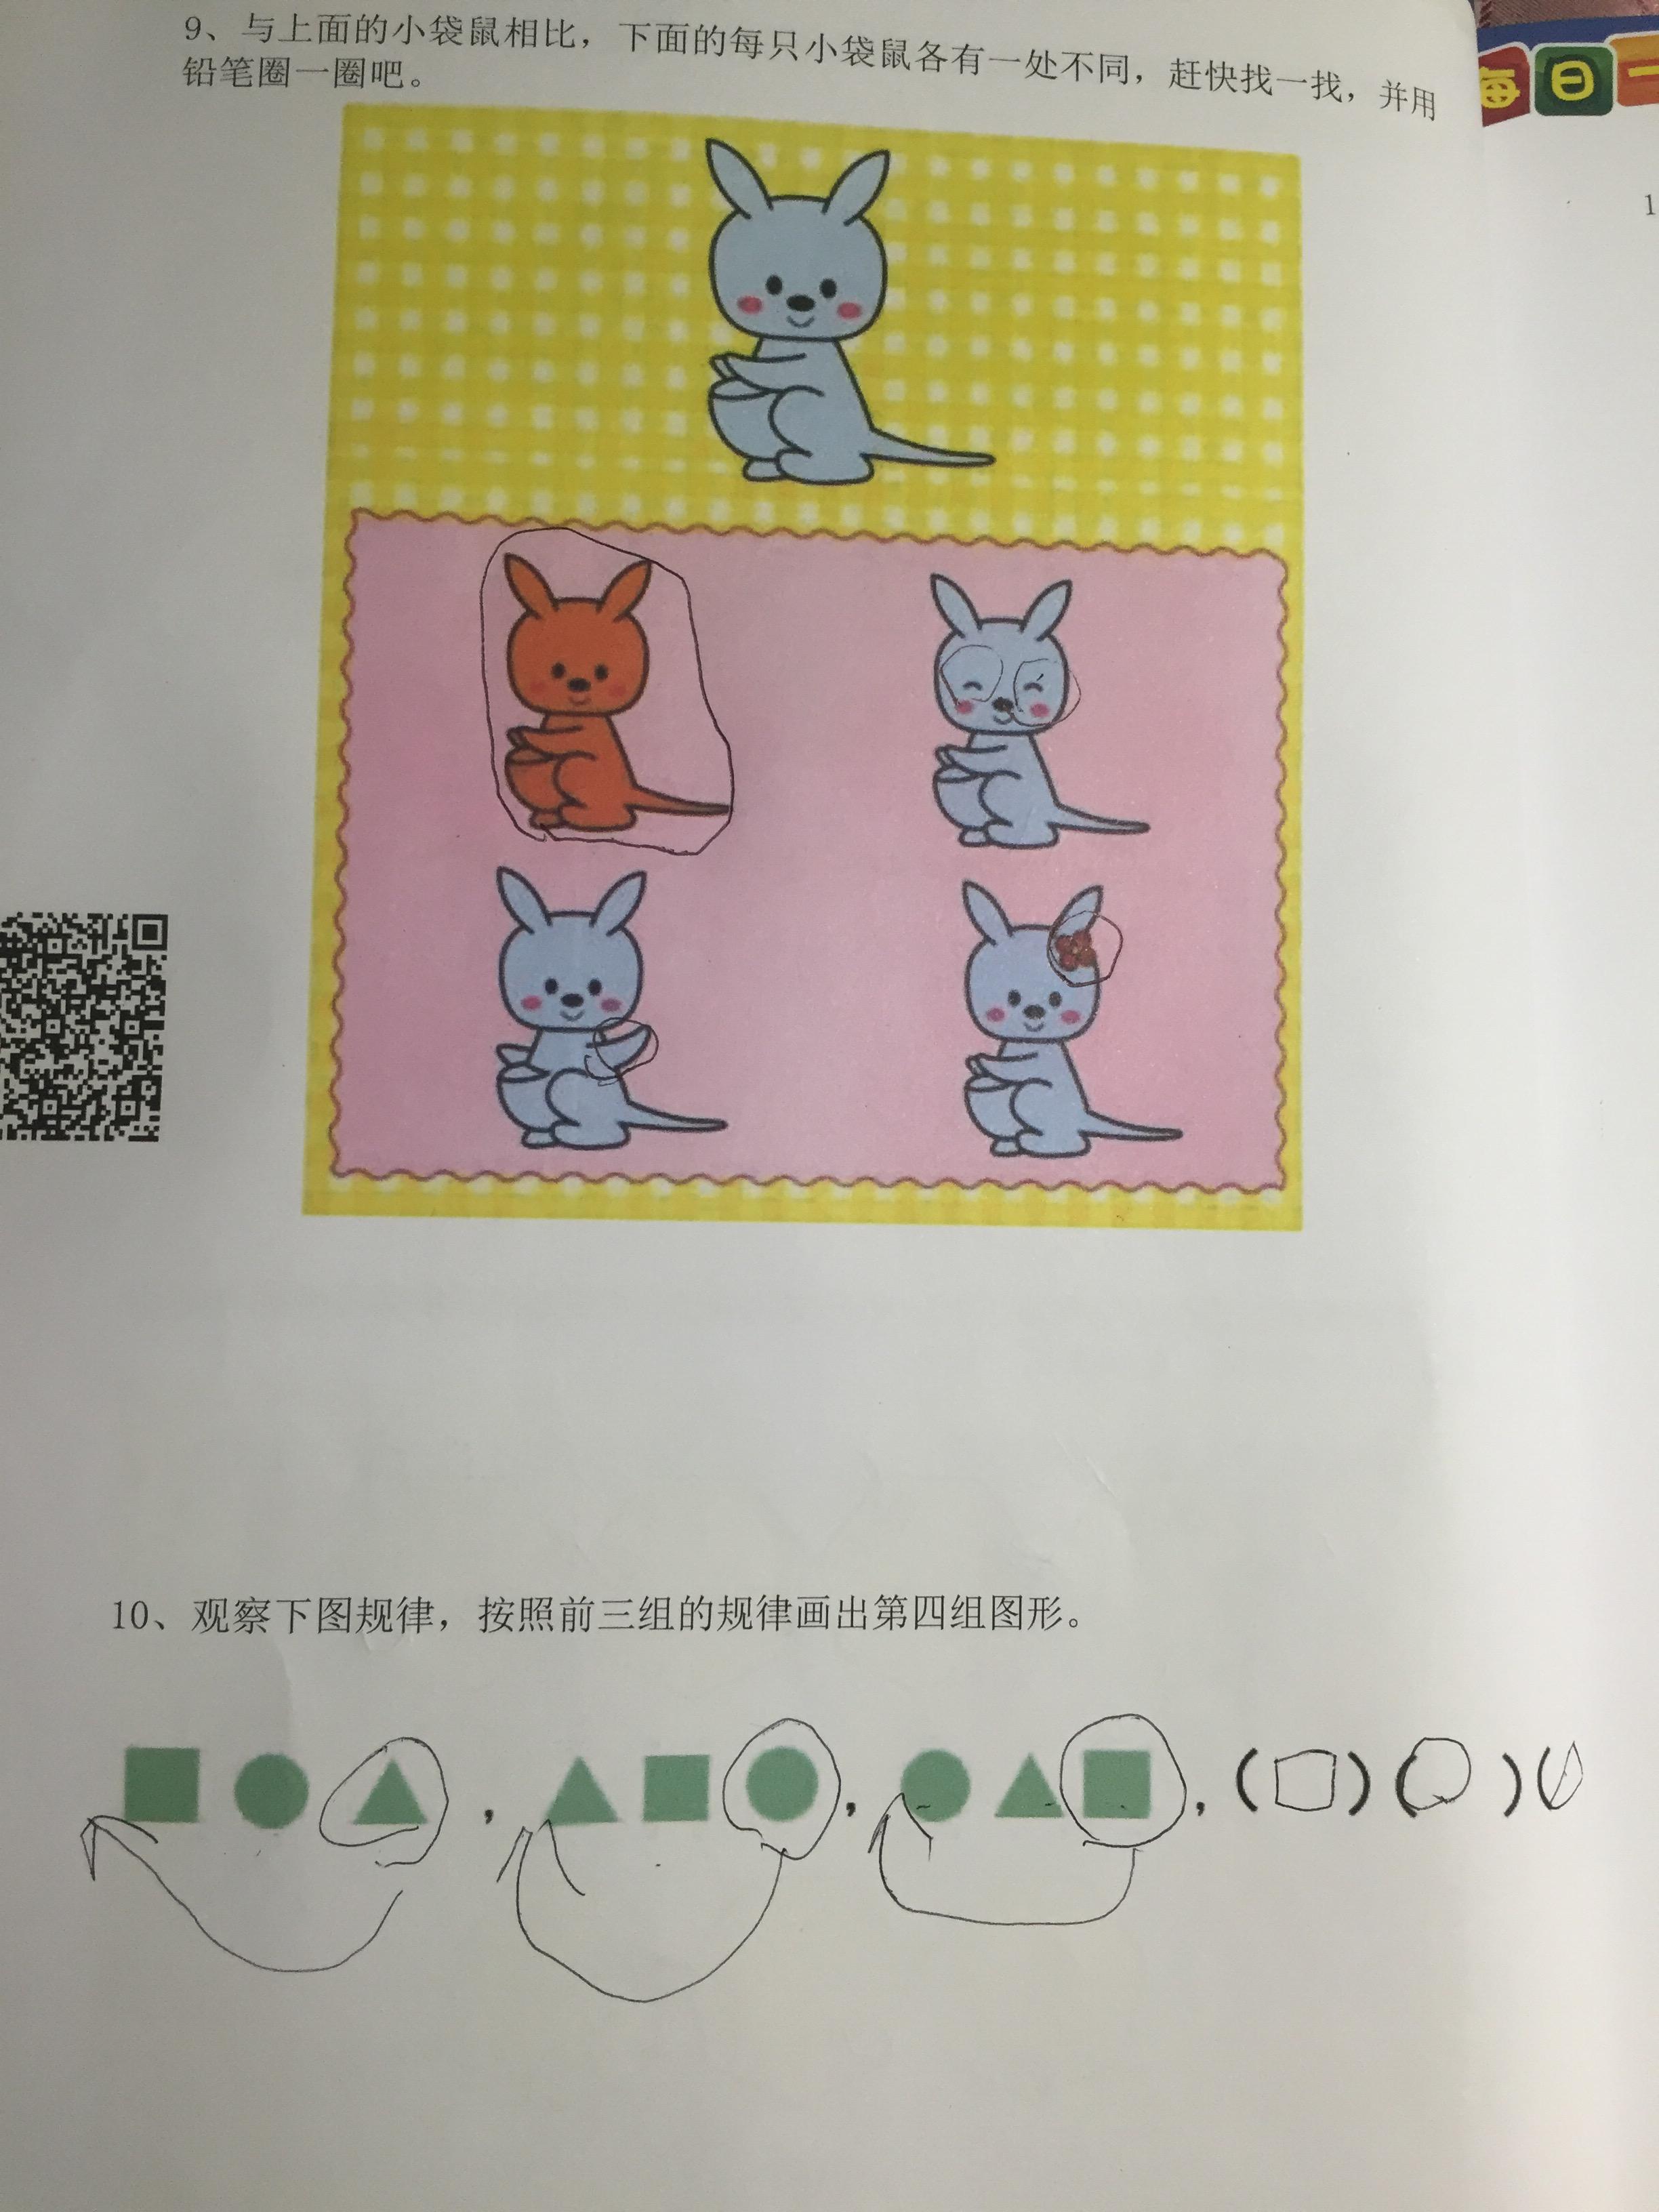 4FED1815-9D45-4A85-BFDA-E6C46B3E67F2.jpg